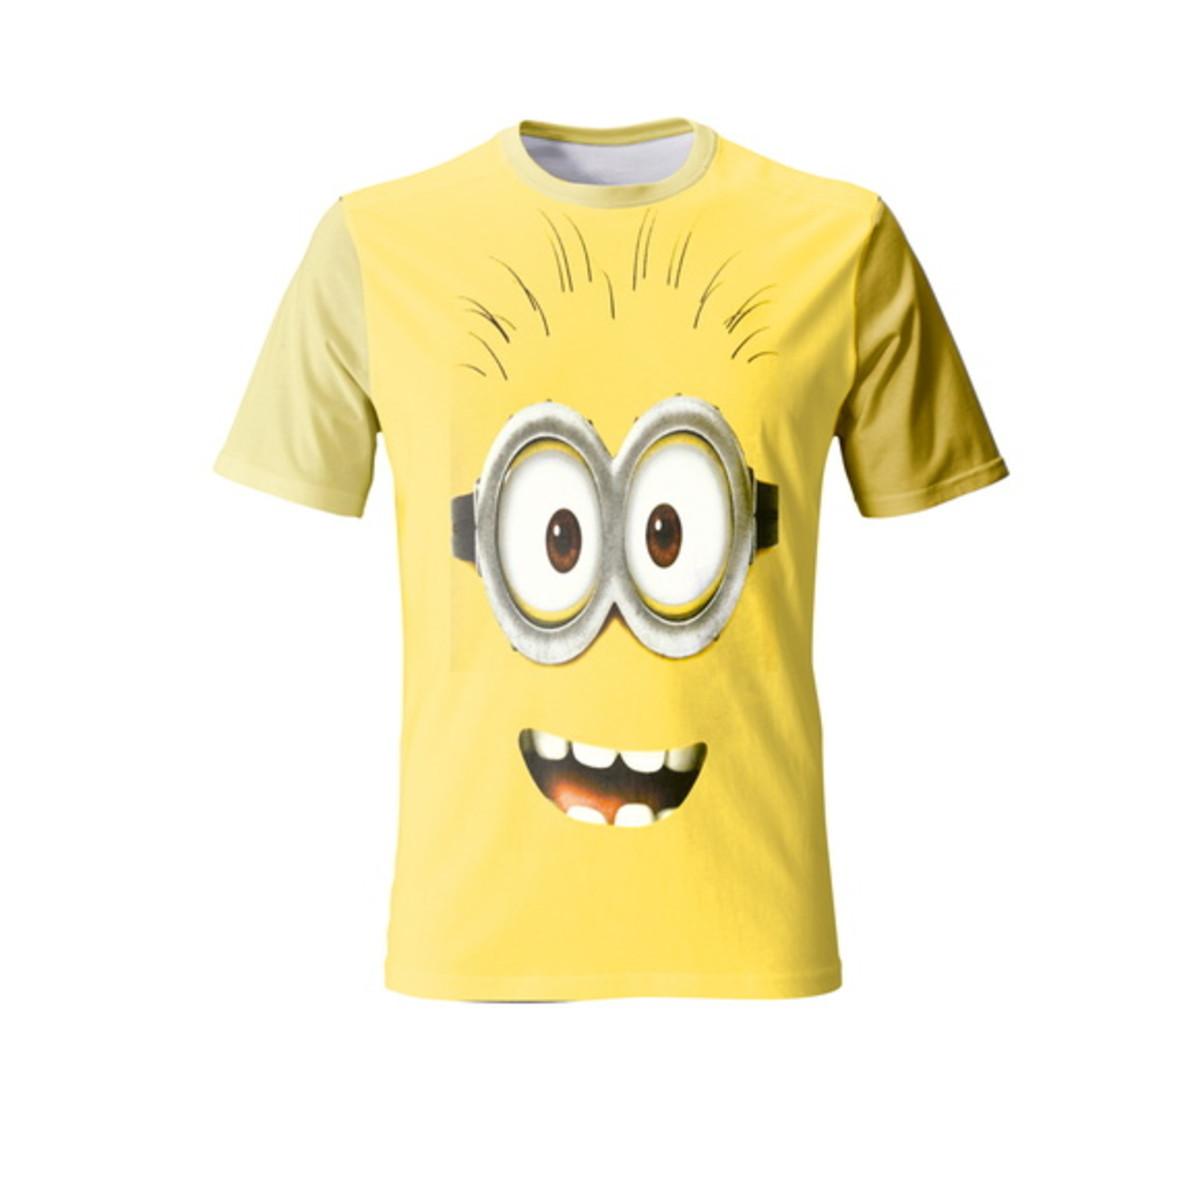 73d7d9675b Camiseta Minions Kevin no Elo7